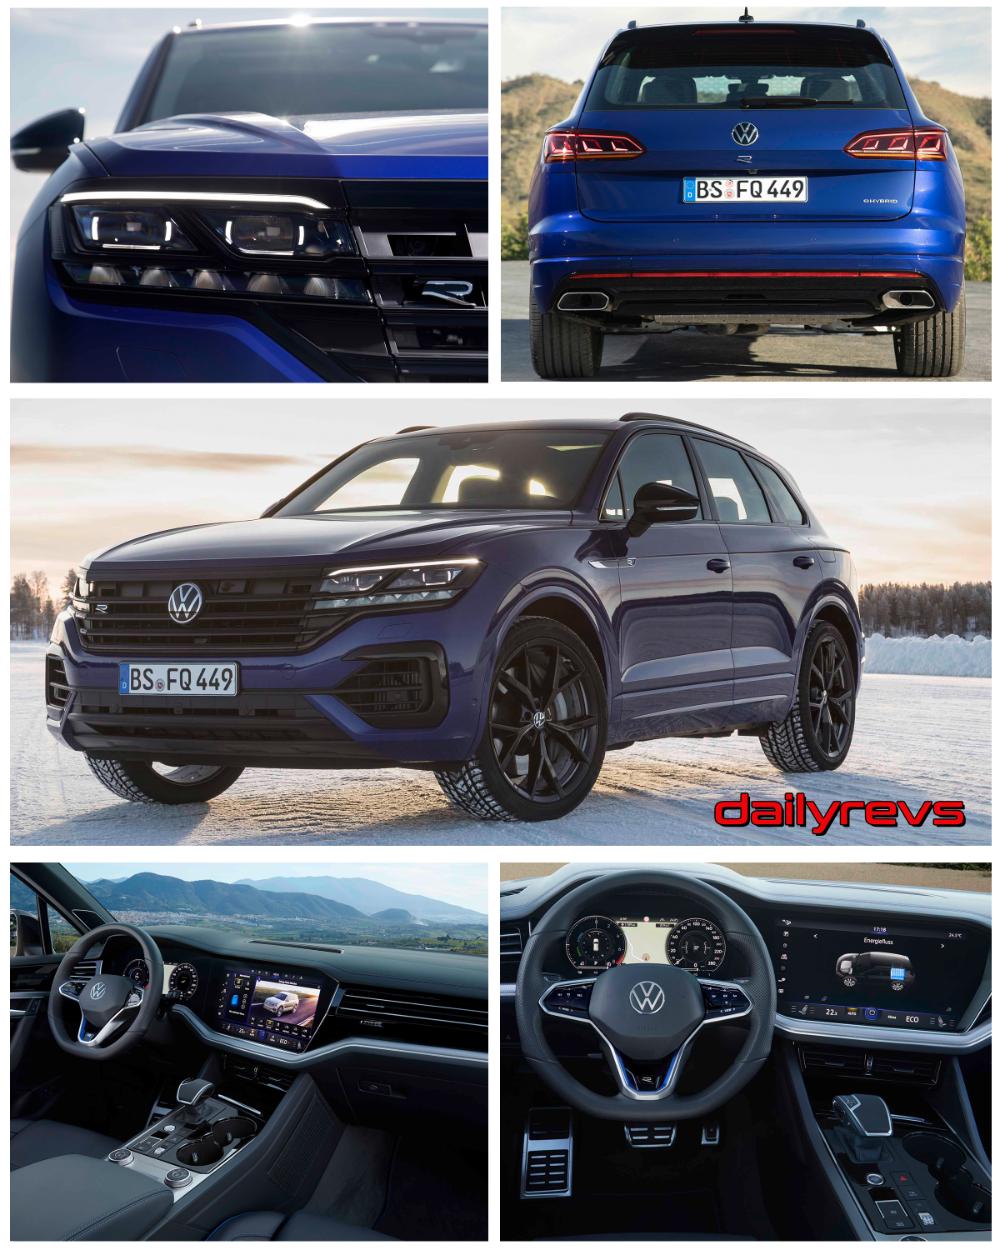 2020 Volkswagen Touareg R PHEV